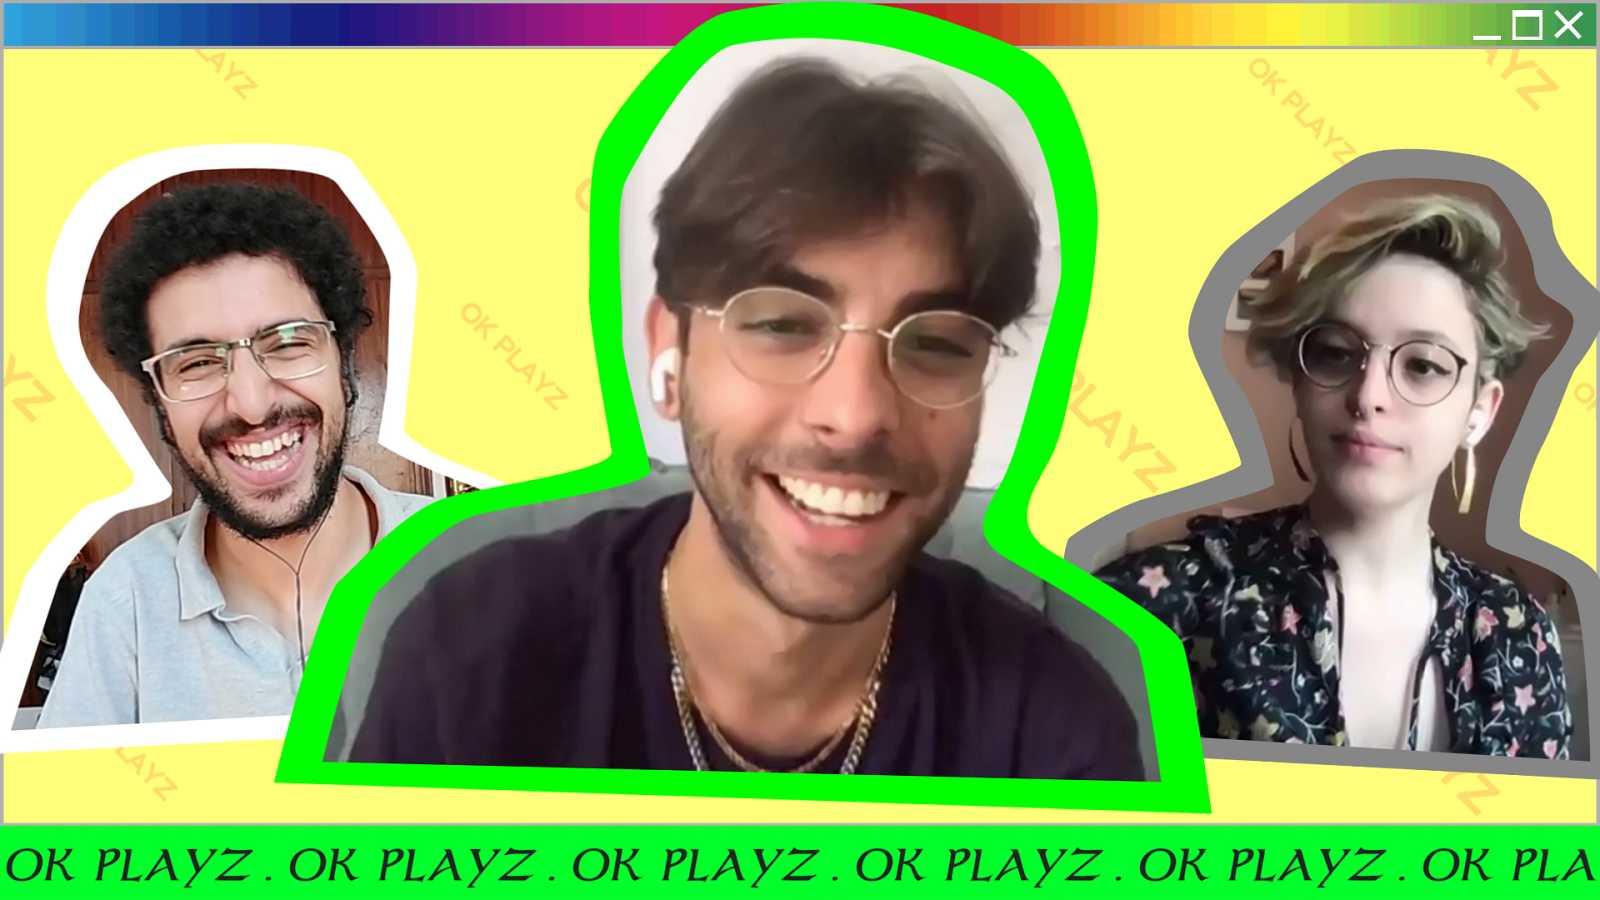 OK Playz - OK Playz con Don Patricio, Yunez y Elizabeth Duval